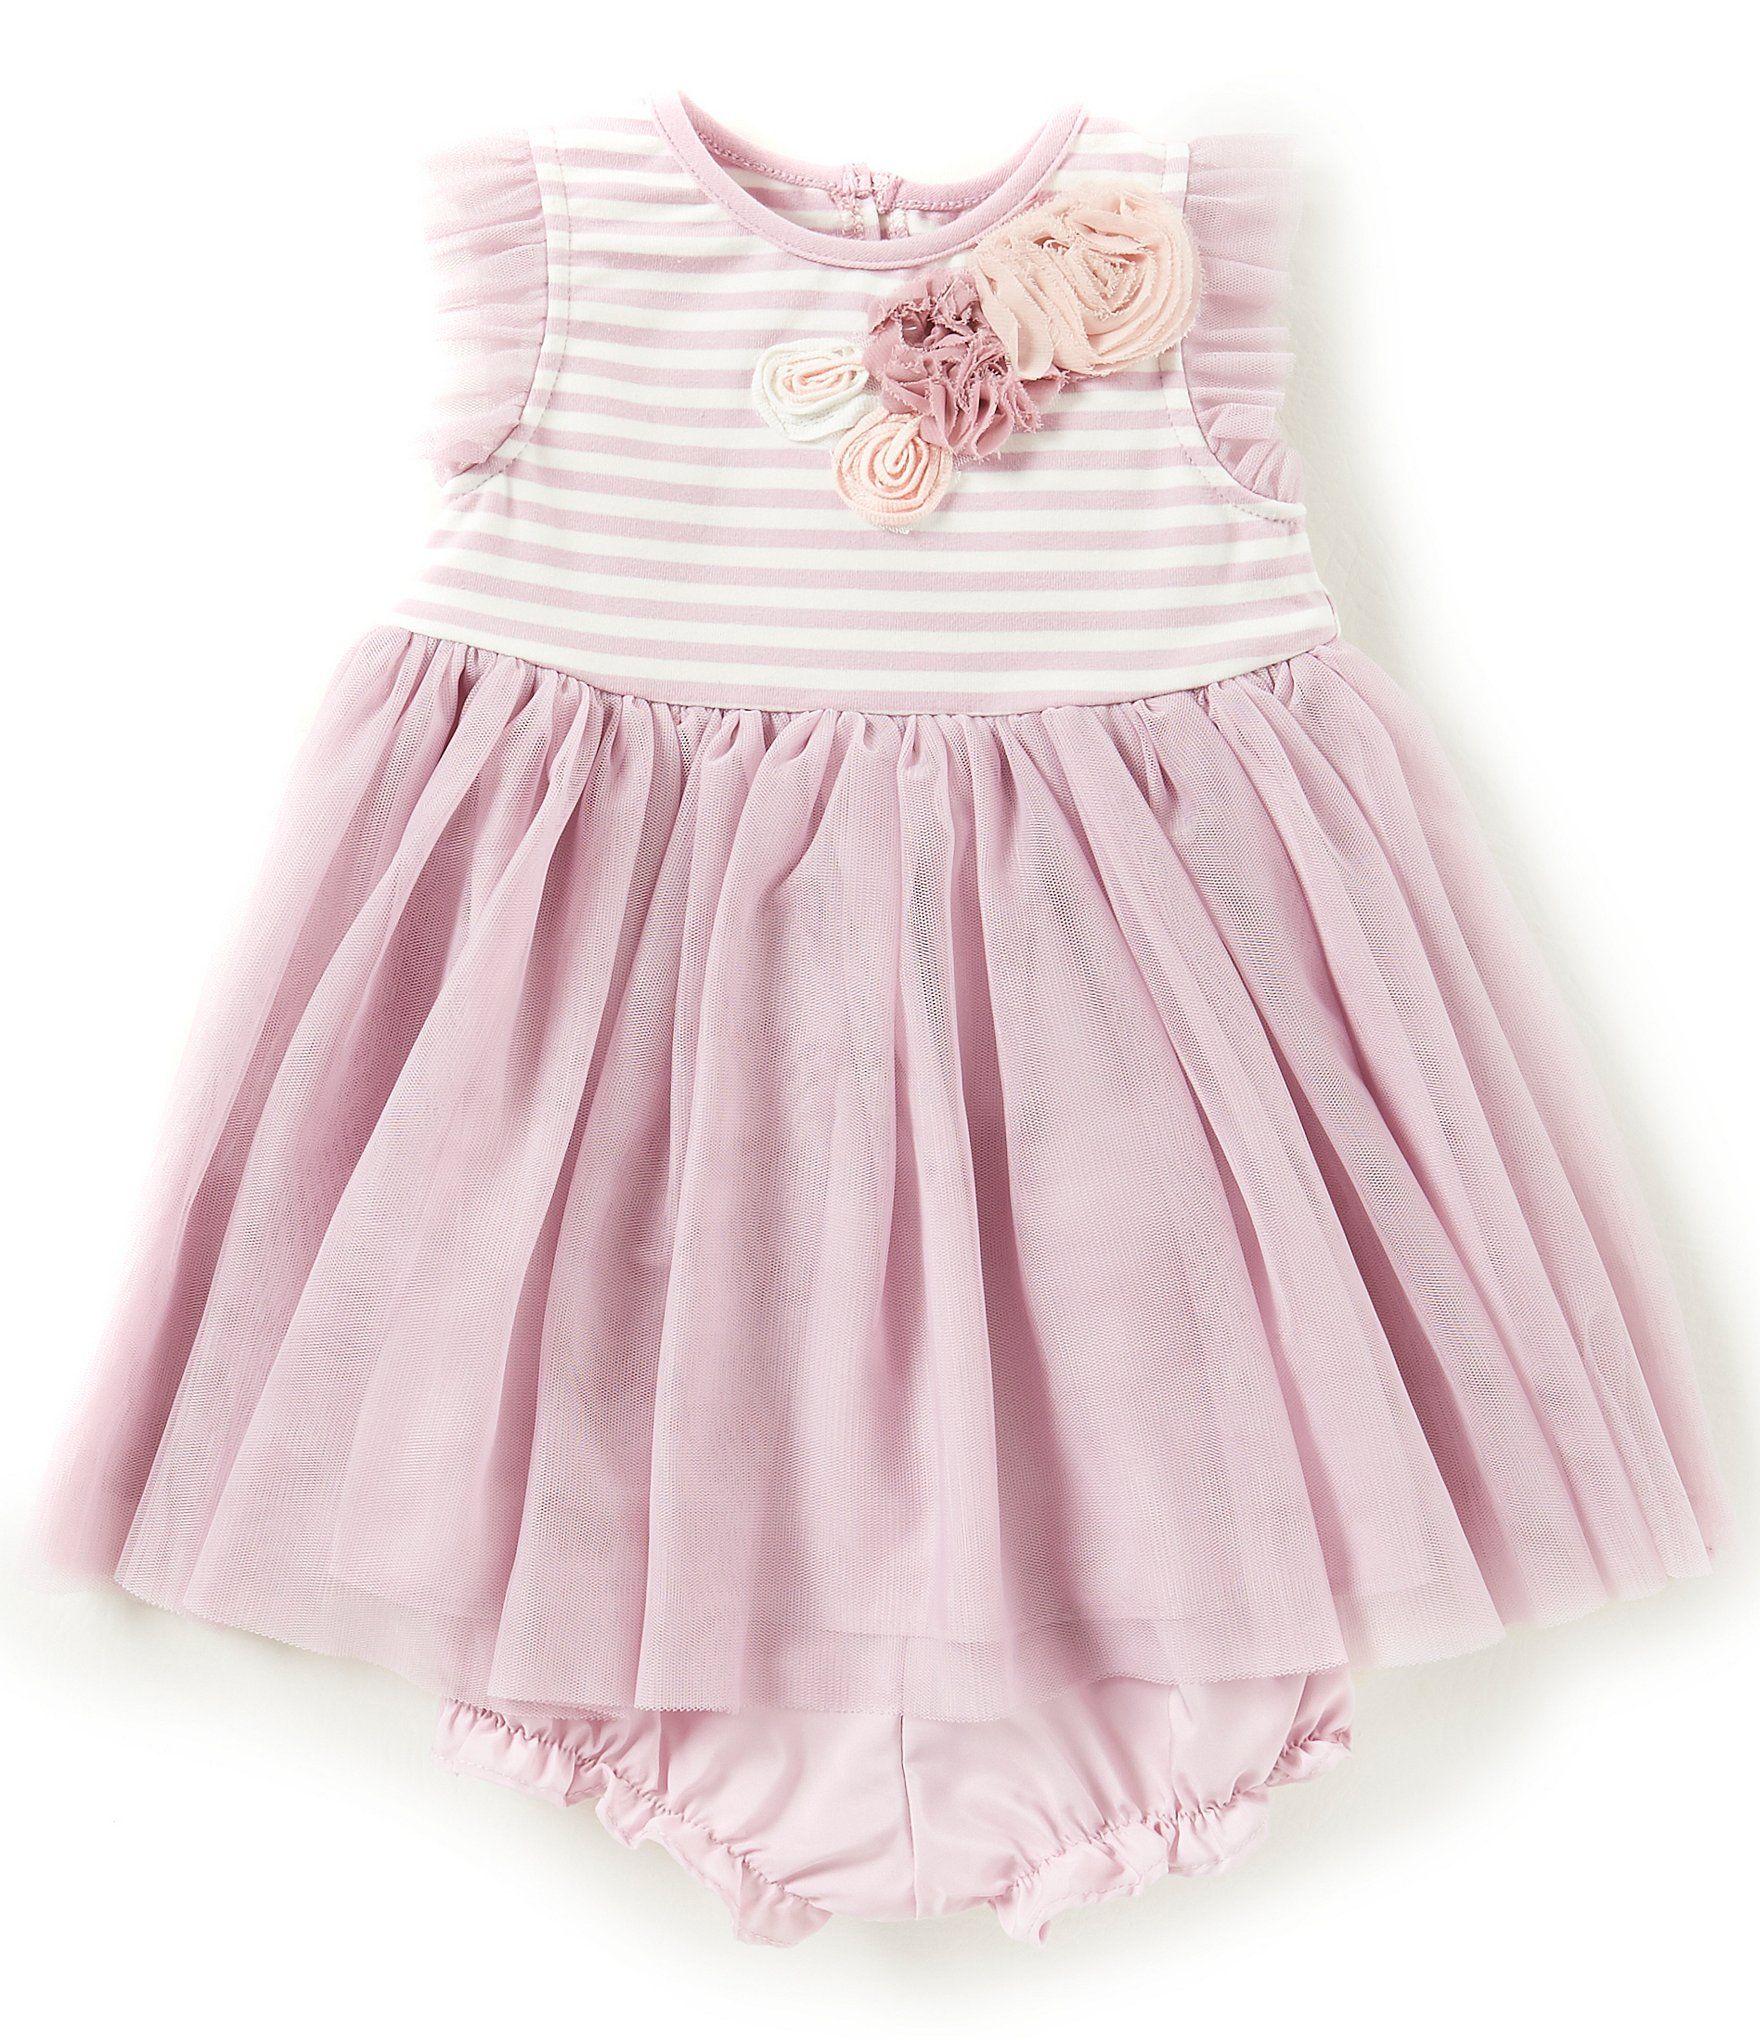 Marmellata Baby Girls 12 24 Months Striped Floral Applique Dress